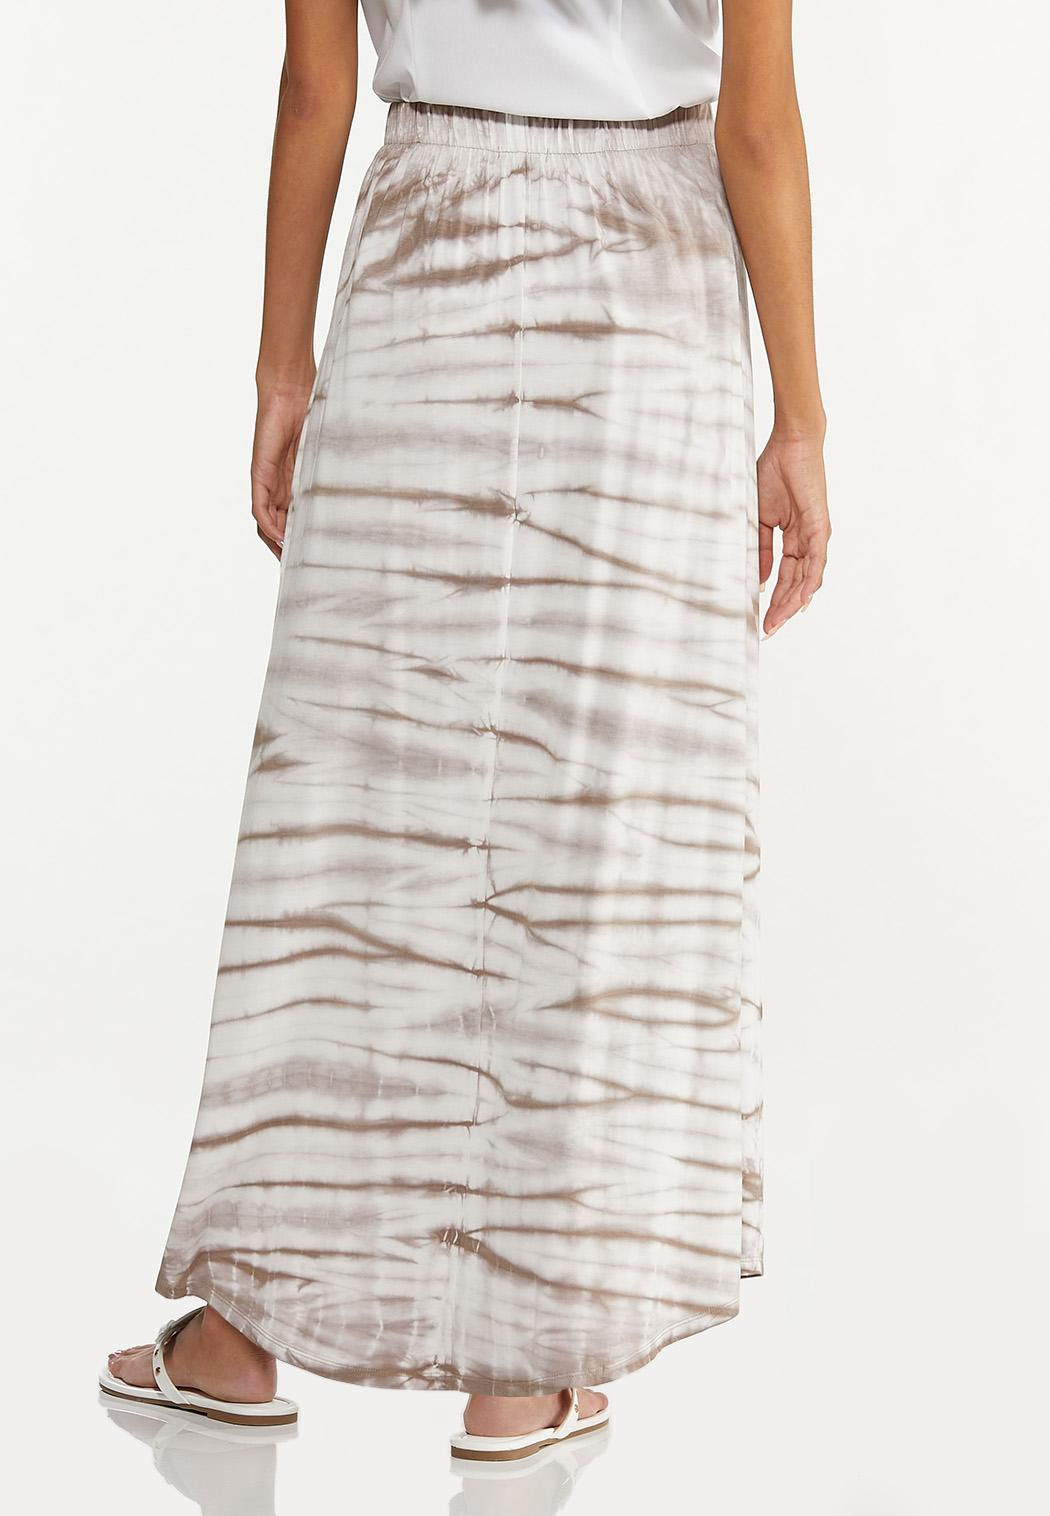 Plus Size Tie Dye Maxi Skirt (Item #44615950)